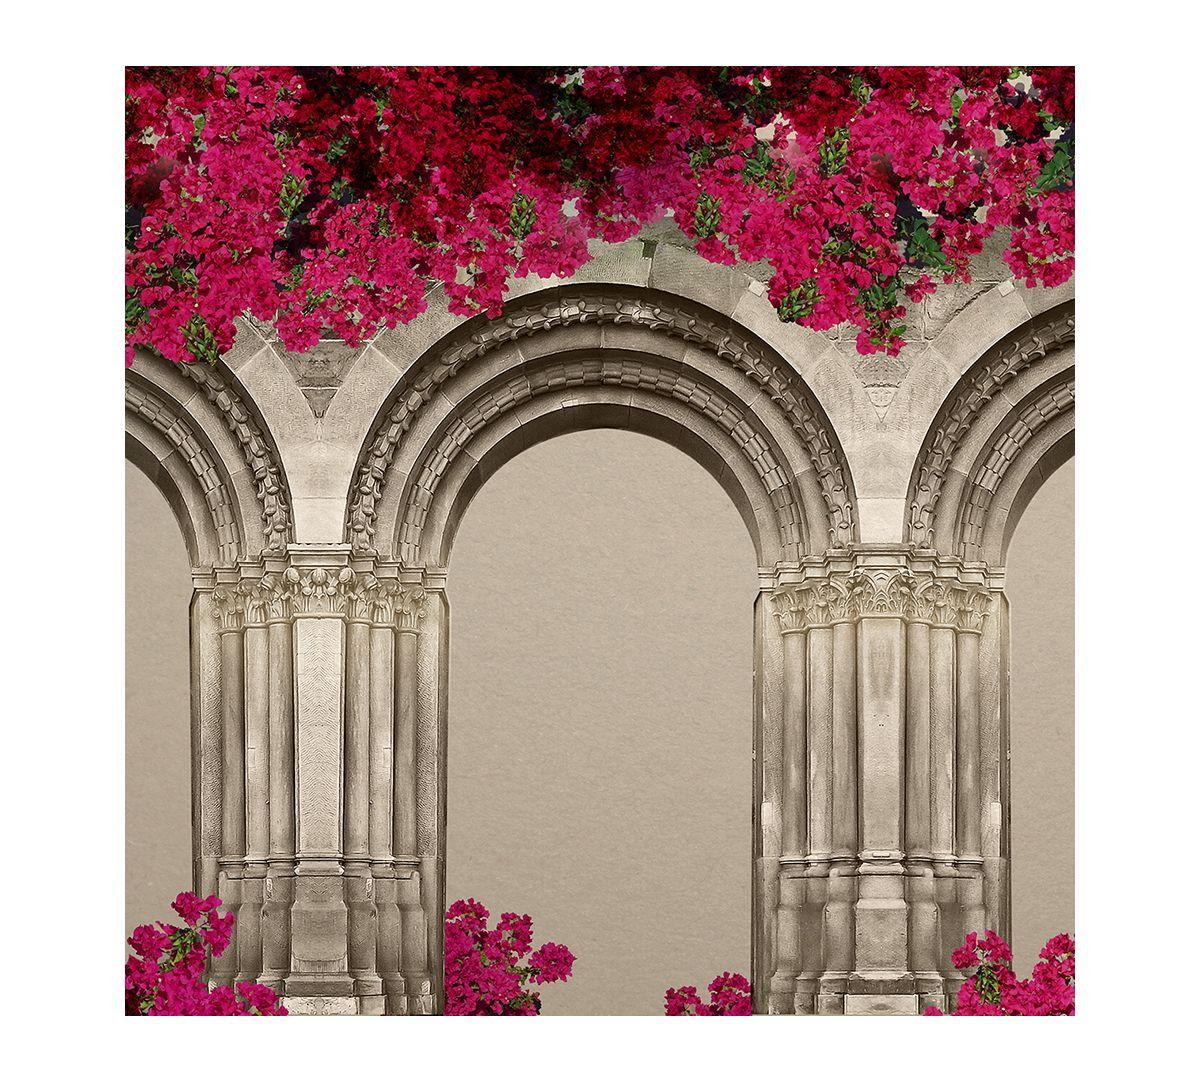 India Circus Arches of Triumph Wallpaper